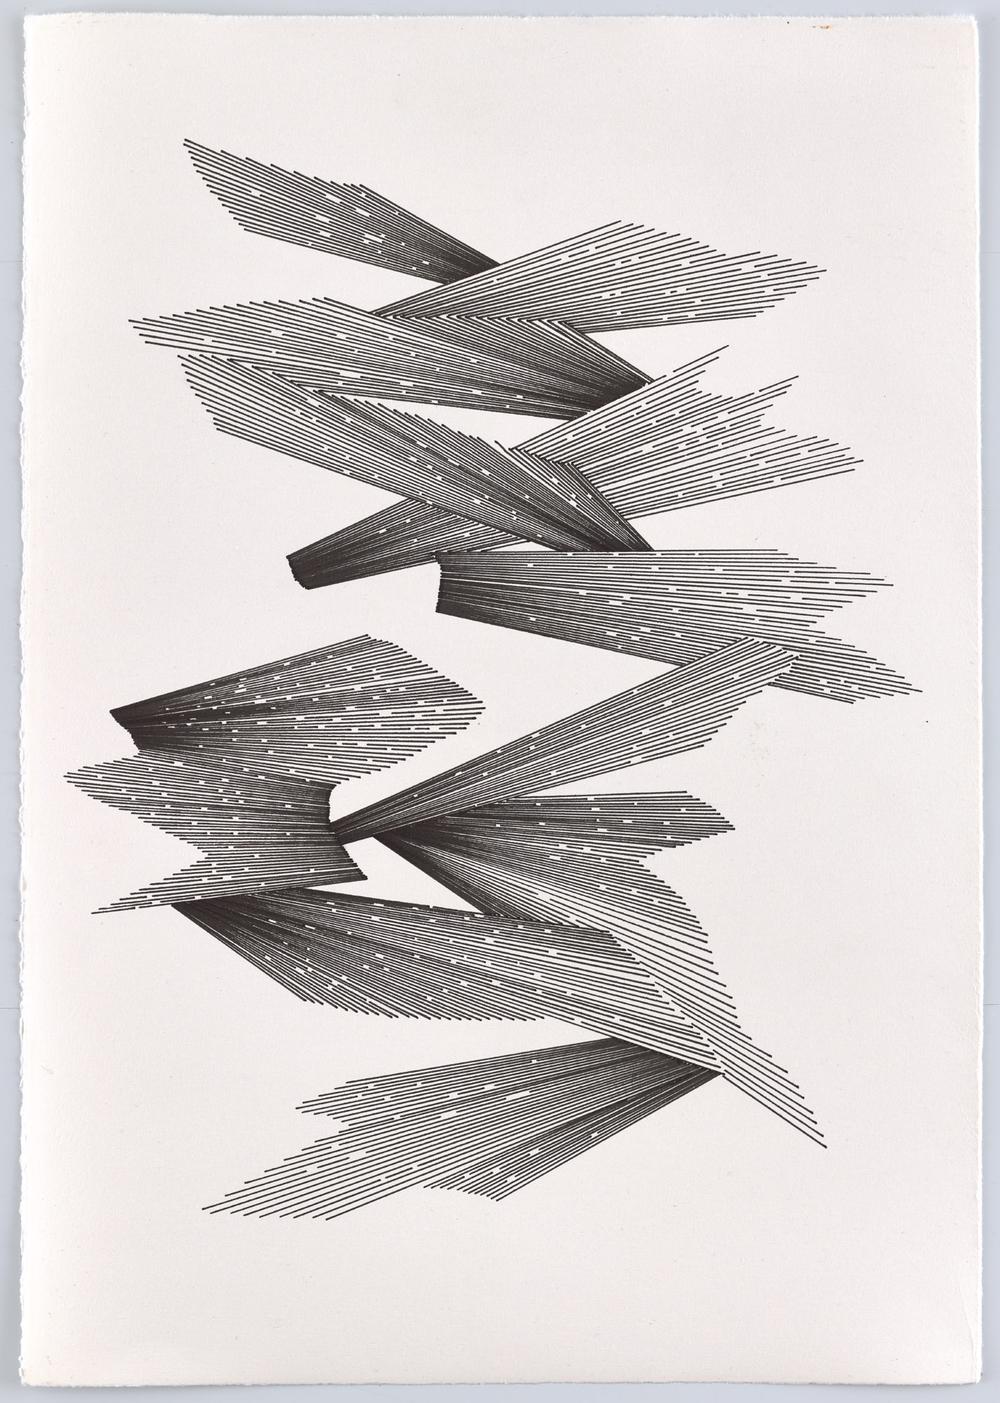 BK P13007 | untitled | pigment liner on paper | 42x29cm | 2016